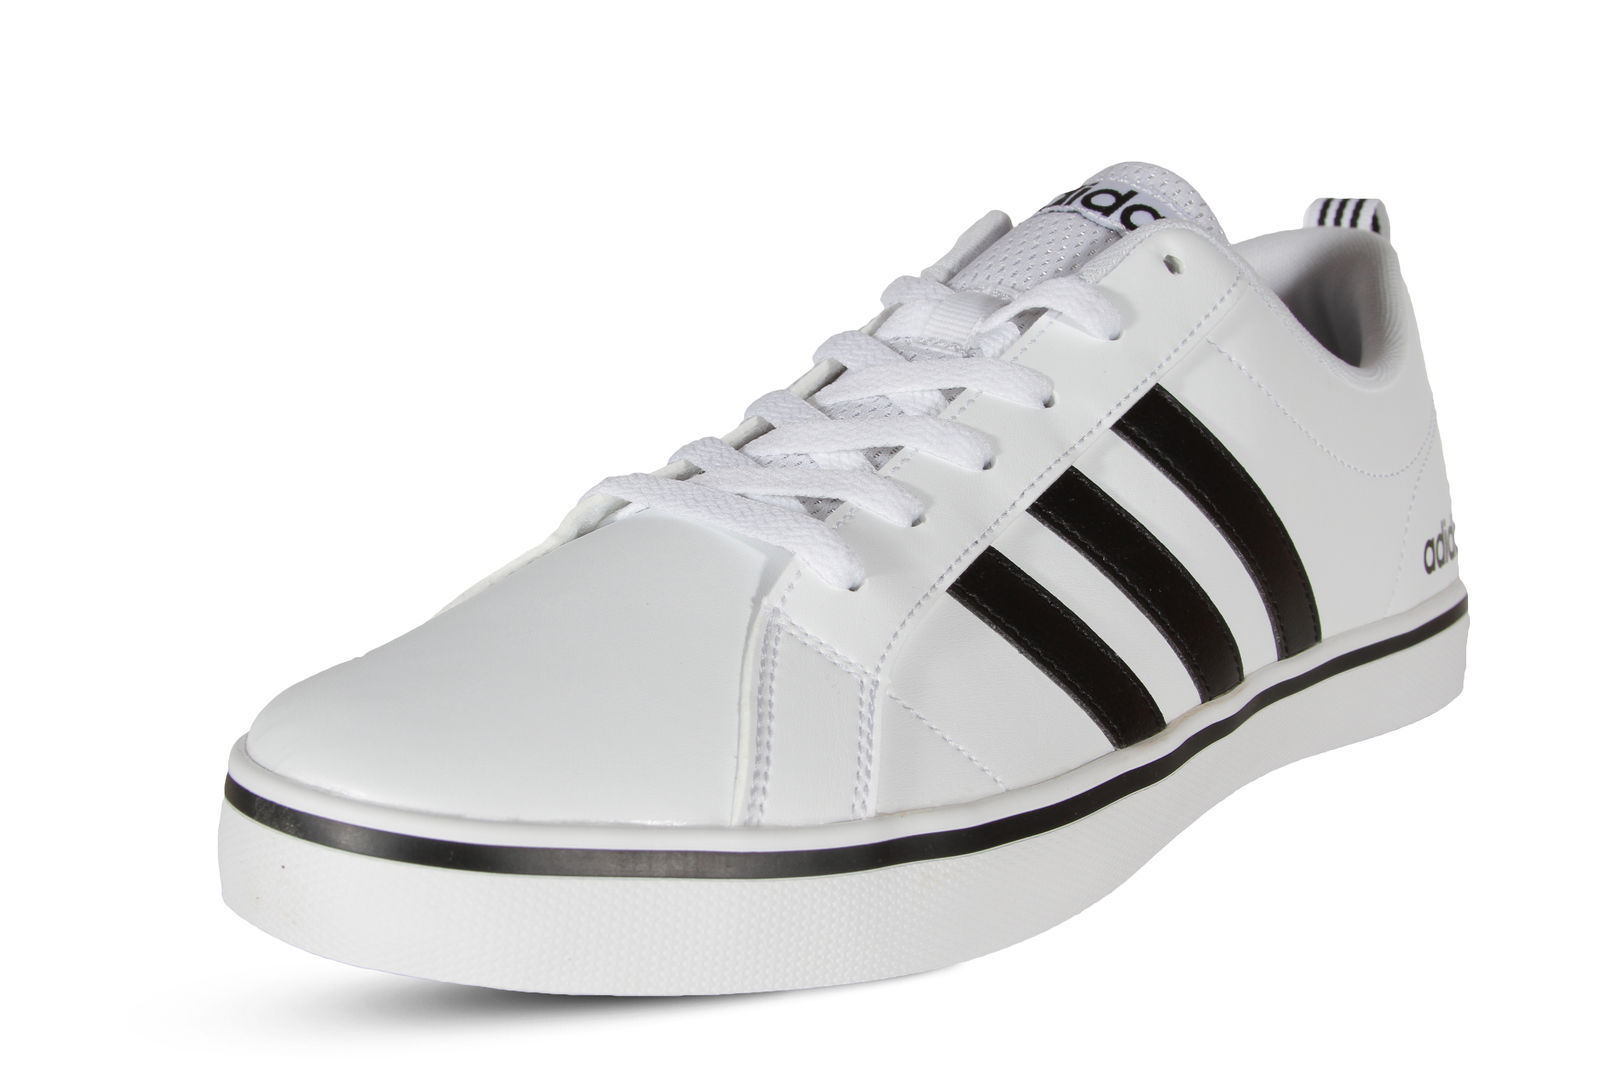 size 40 e0814 703da Adidas Performance Men's Pace Vs-M Fashion Sneaker